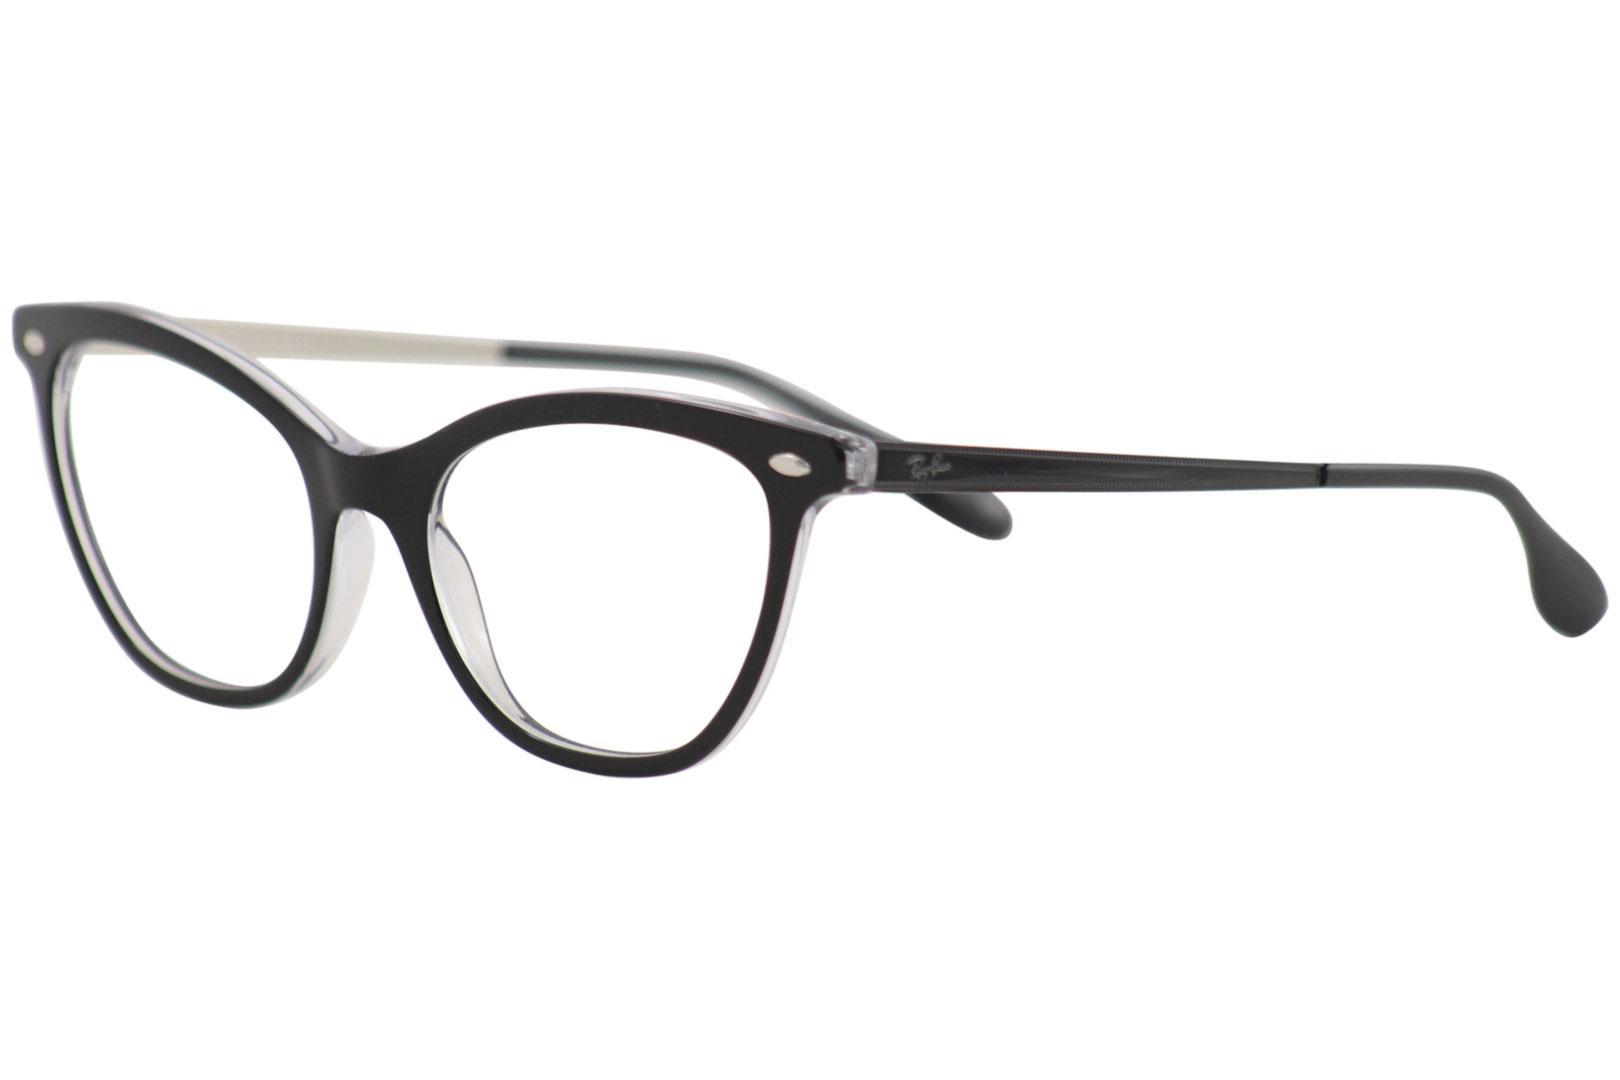 Ray Ban Women's Eyeglasses RB5360 RX 5360 Full Rim RayBan Optical Frame bd724bb3a446